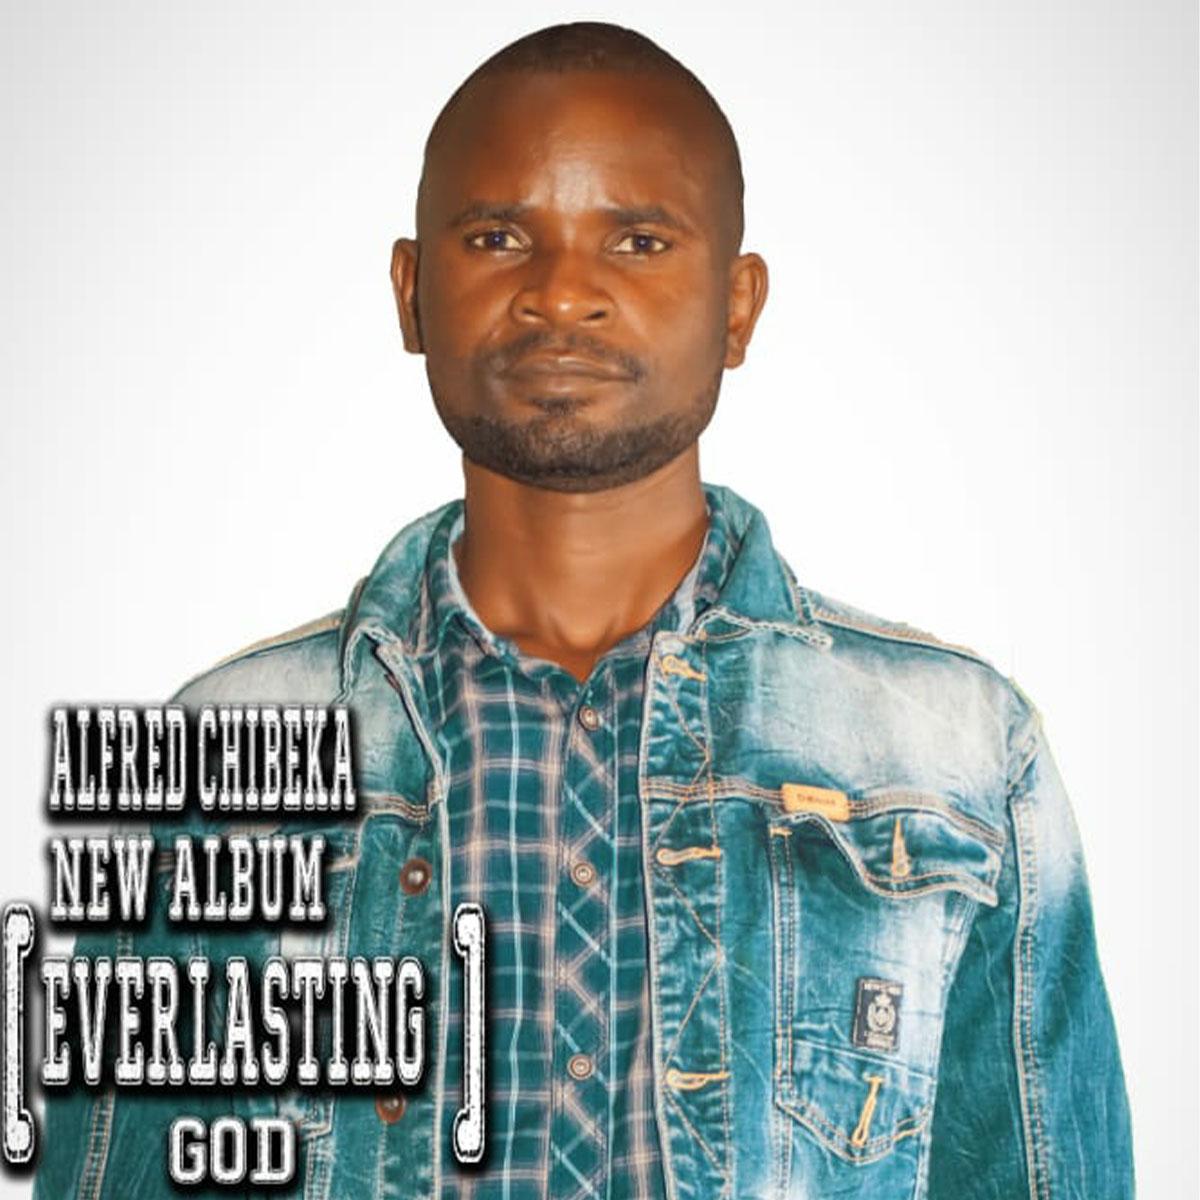 Alfred Chibeka ft. Shy Kid - Everlasting God